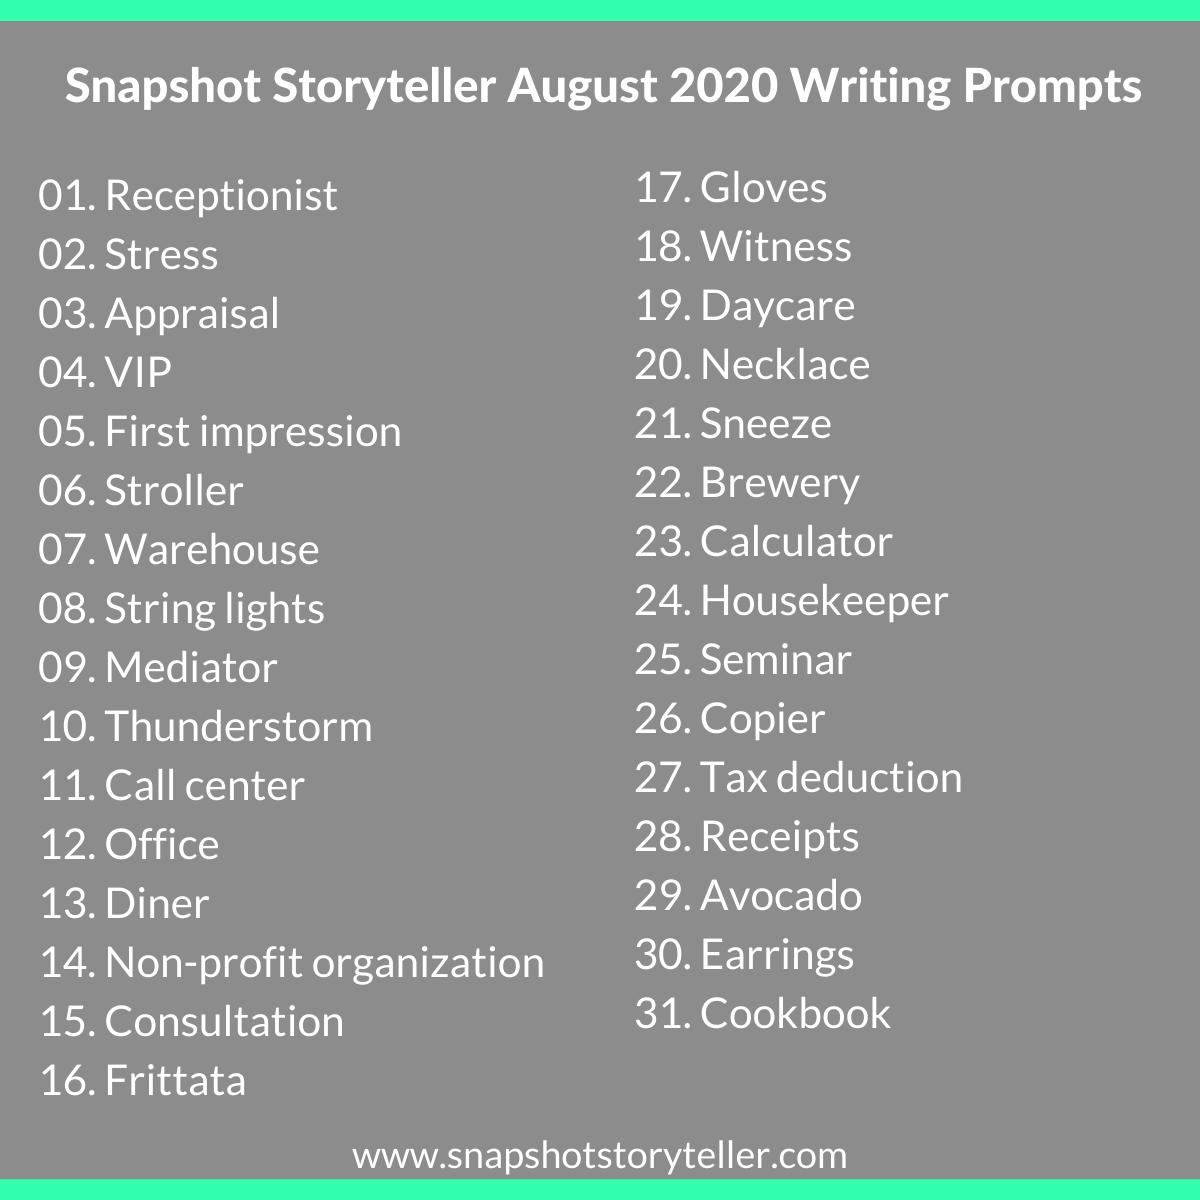 Snapshot Storyteller | August 2020 Writing Prompts | www.snapshotstoryteller.com | #amwriting #SnapshotStoryteller #creativestoryteller #creative #storyteller #creativewriter #IWrite #WriteOn #writersofinstagram#writingprompt #writingprompts